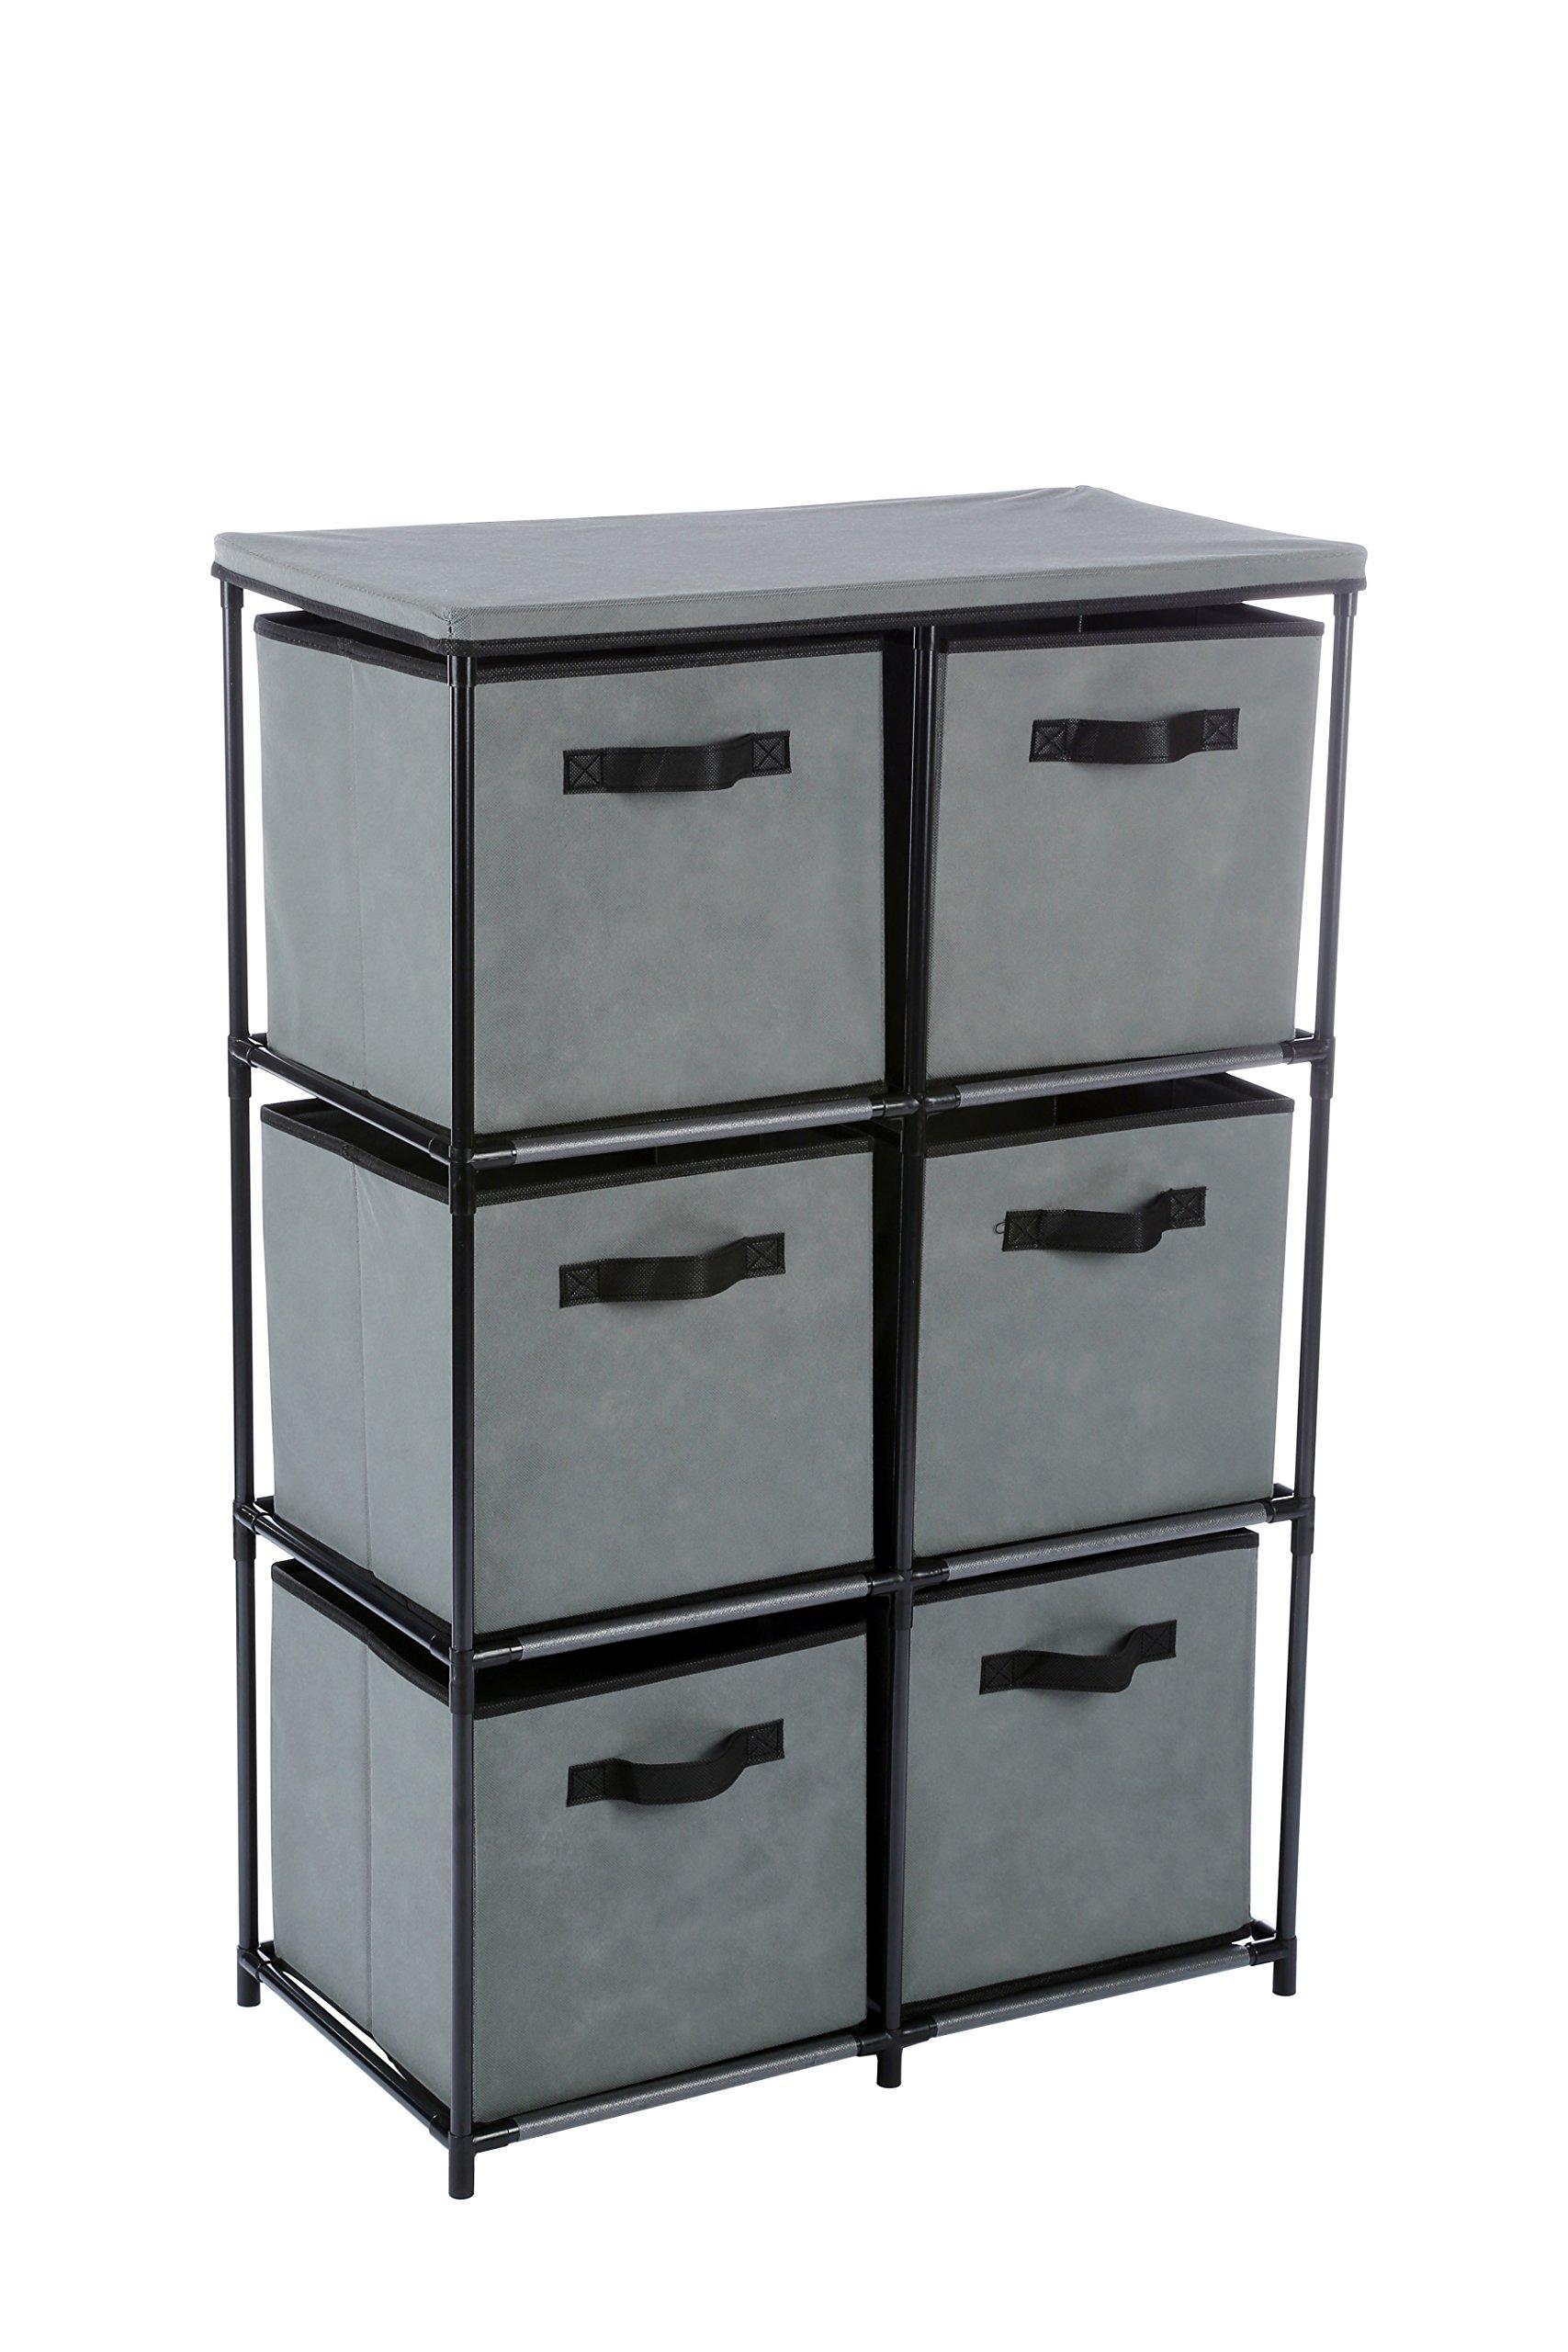 Homebi 6-Drawer Storage Chest Shelf Unit Storage Cabinet Multi-Bin Organizer with Removable Non-woven Fabric Bins in Grey,25''W x 13.2''D x38.0''H by HOME BI